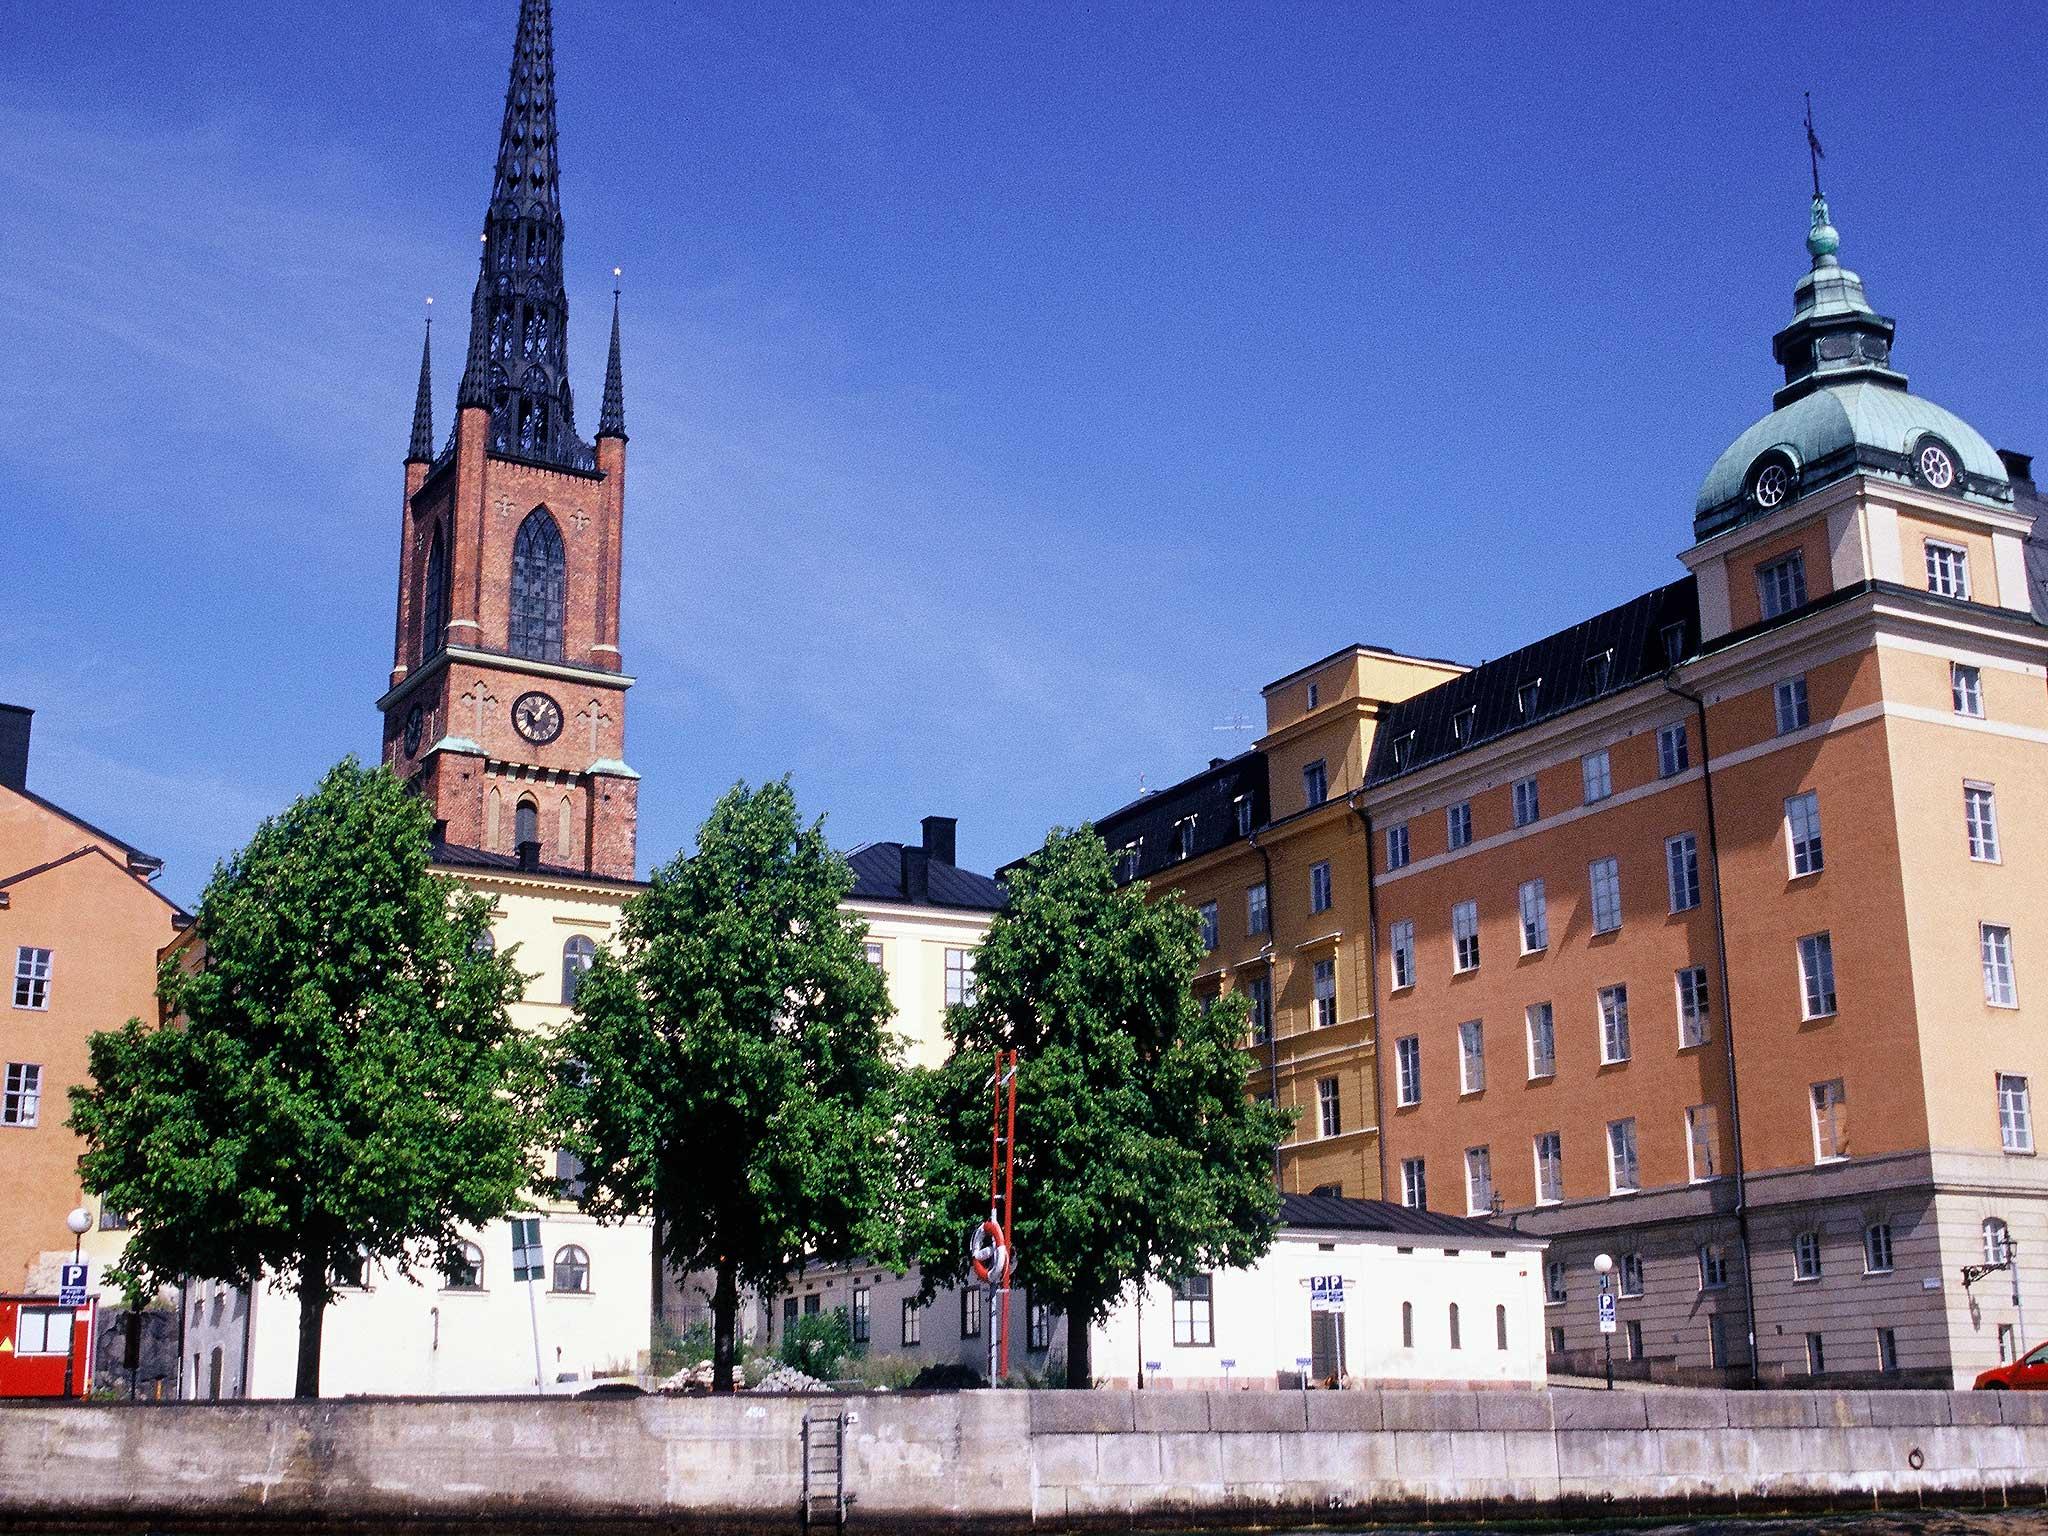 Escorttjänster escorts in sweden